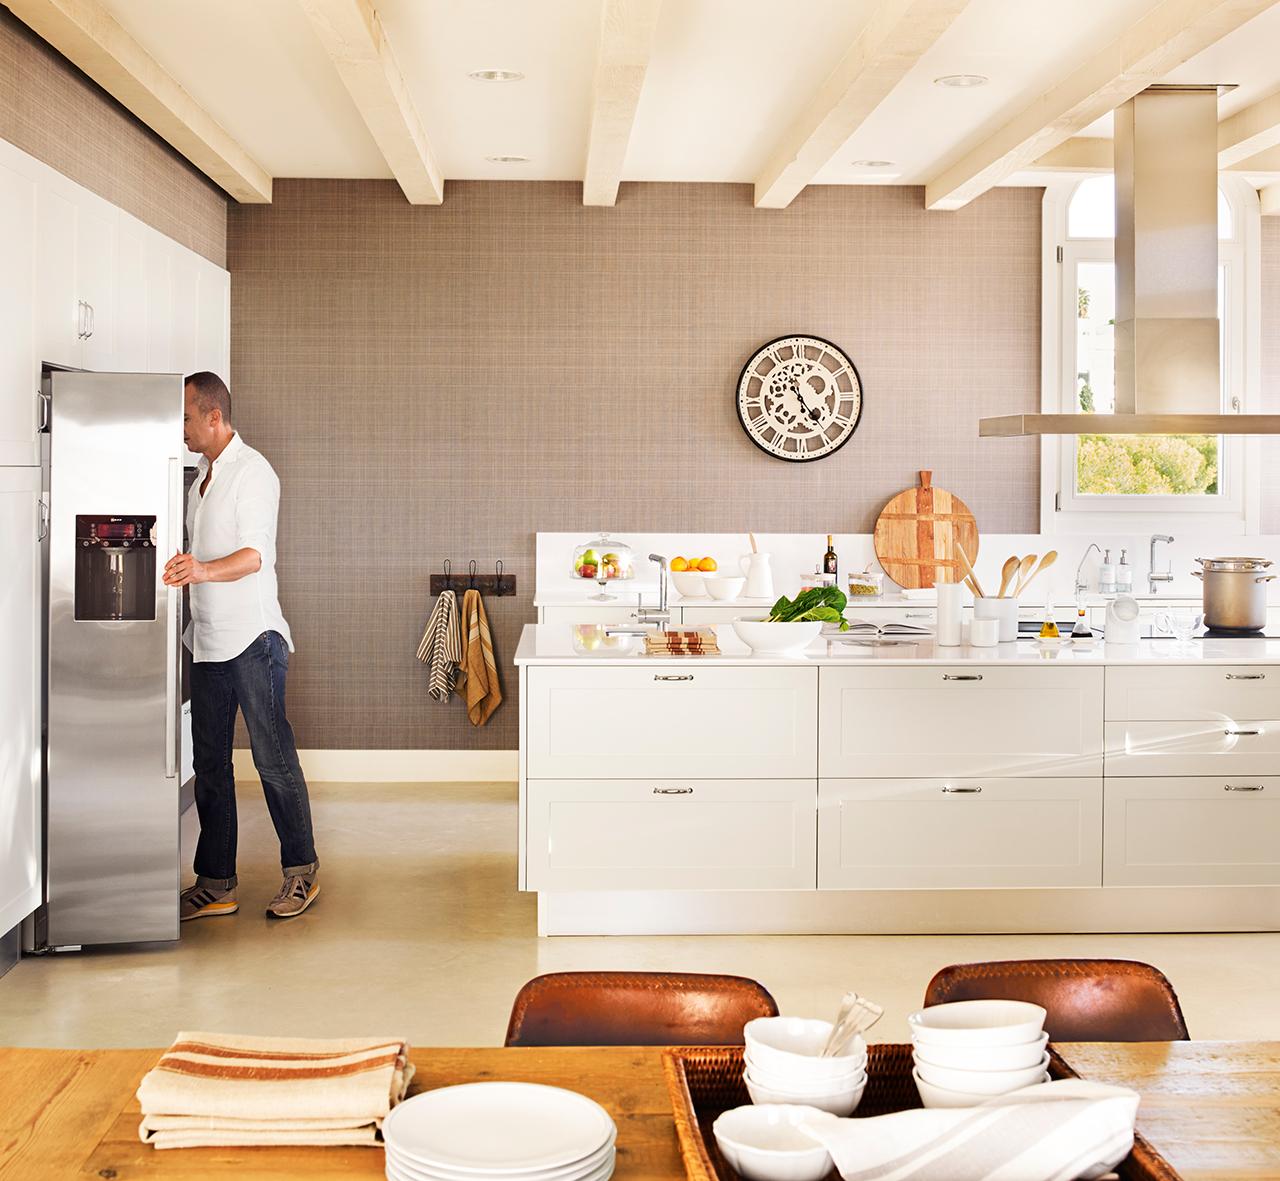 Muebles pintados gris 20170831123930 for Muebles blancos y grises